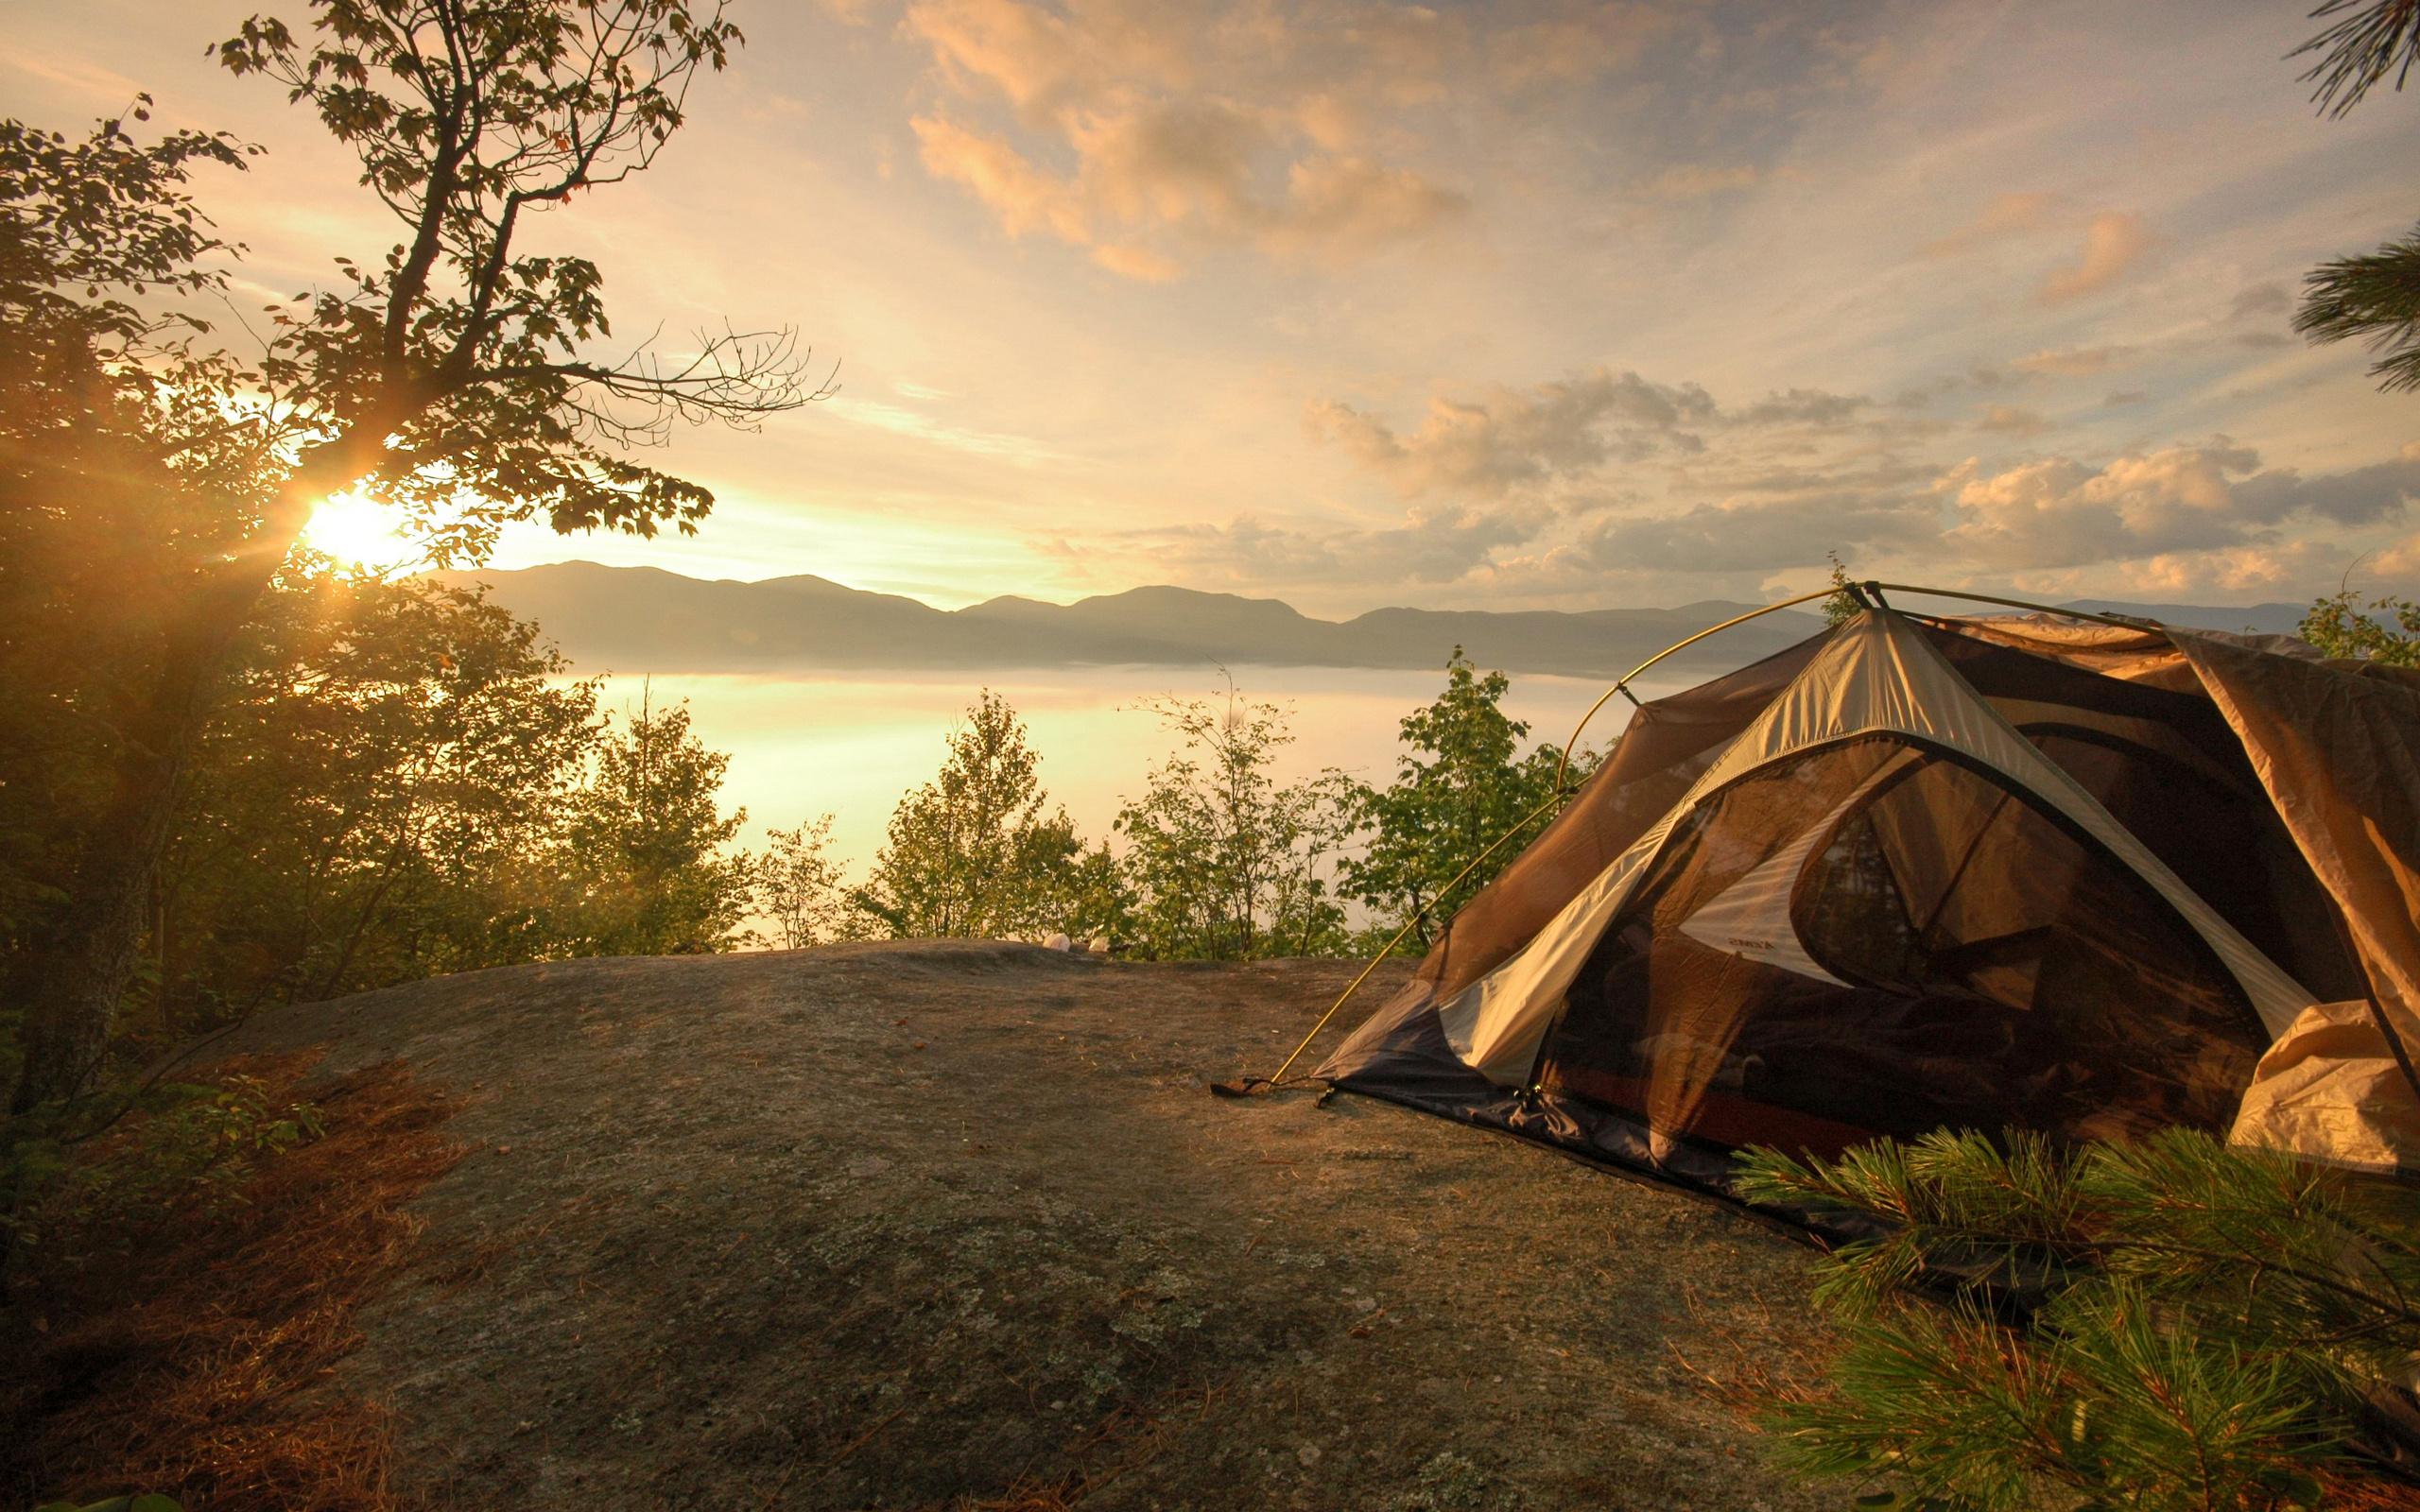 camping-wallpaper-17